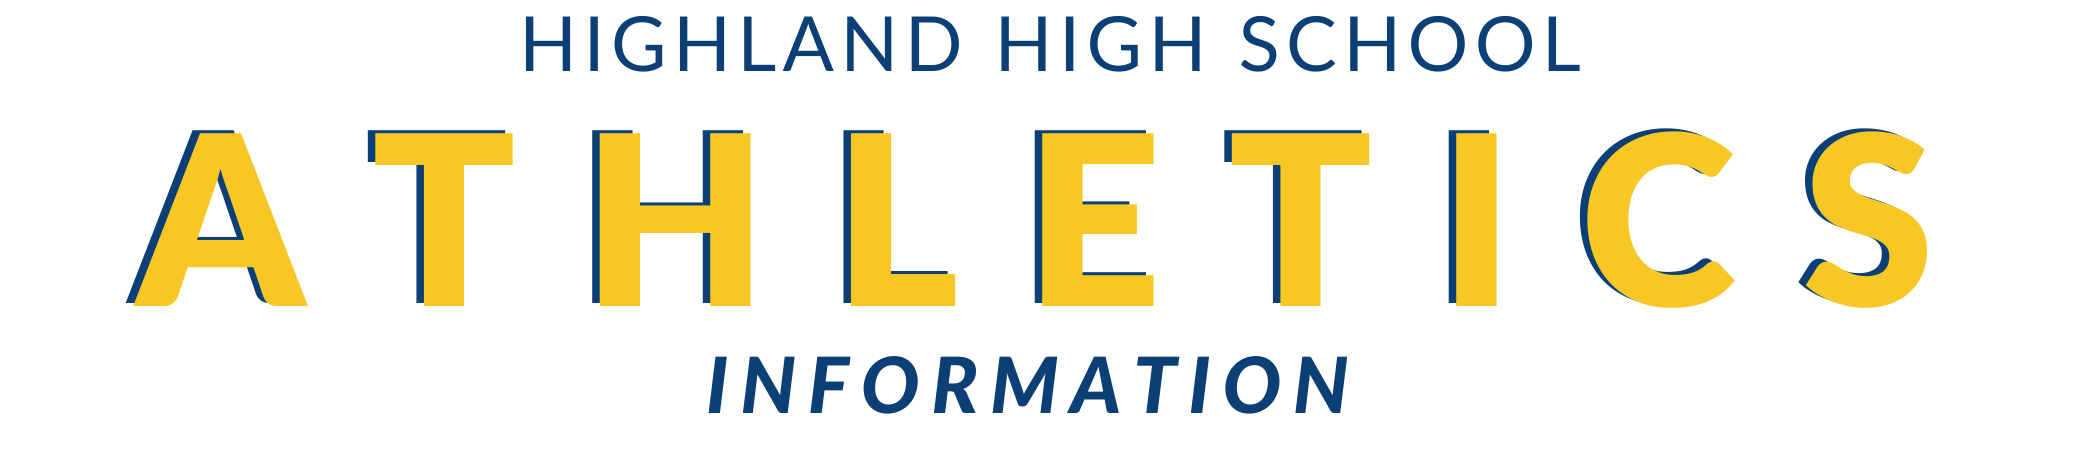 Highland High School Athletics Information